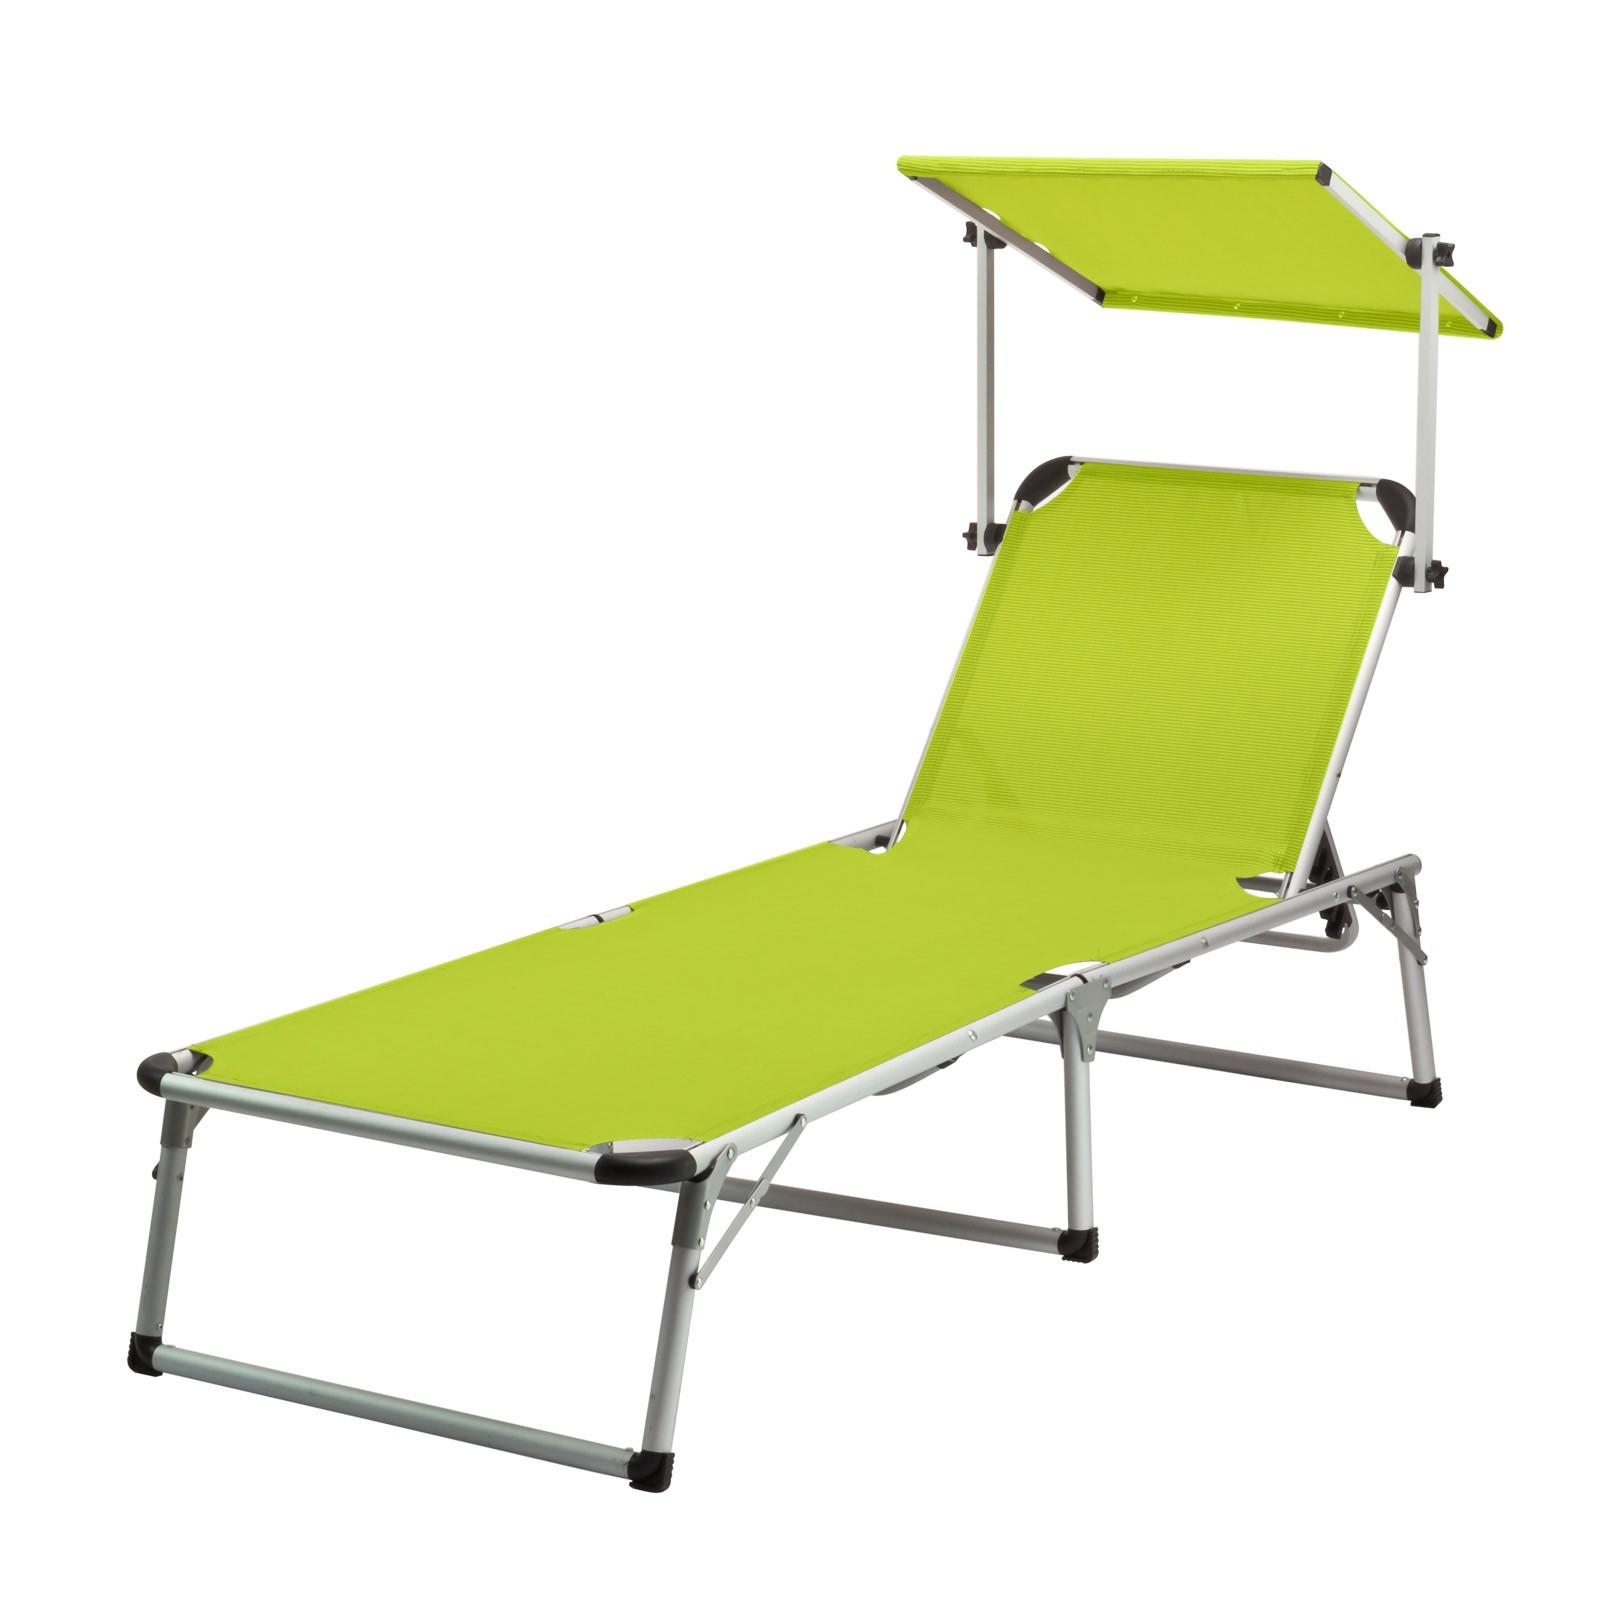 gartenliege sonnenliege colorado springs mit sonnendach limette 192 cm. Black Bedroom Furniture Sets. Home Design Ideas